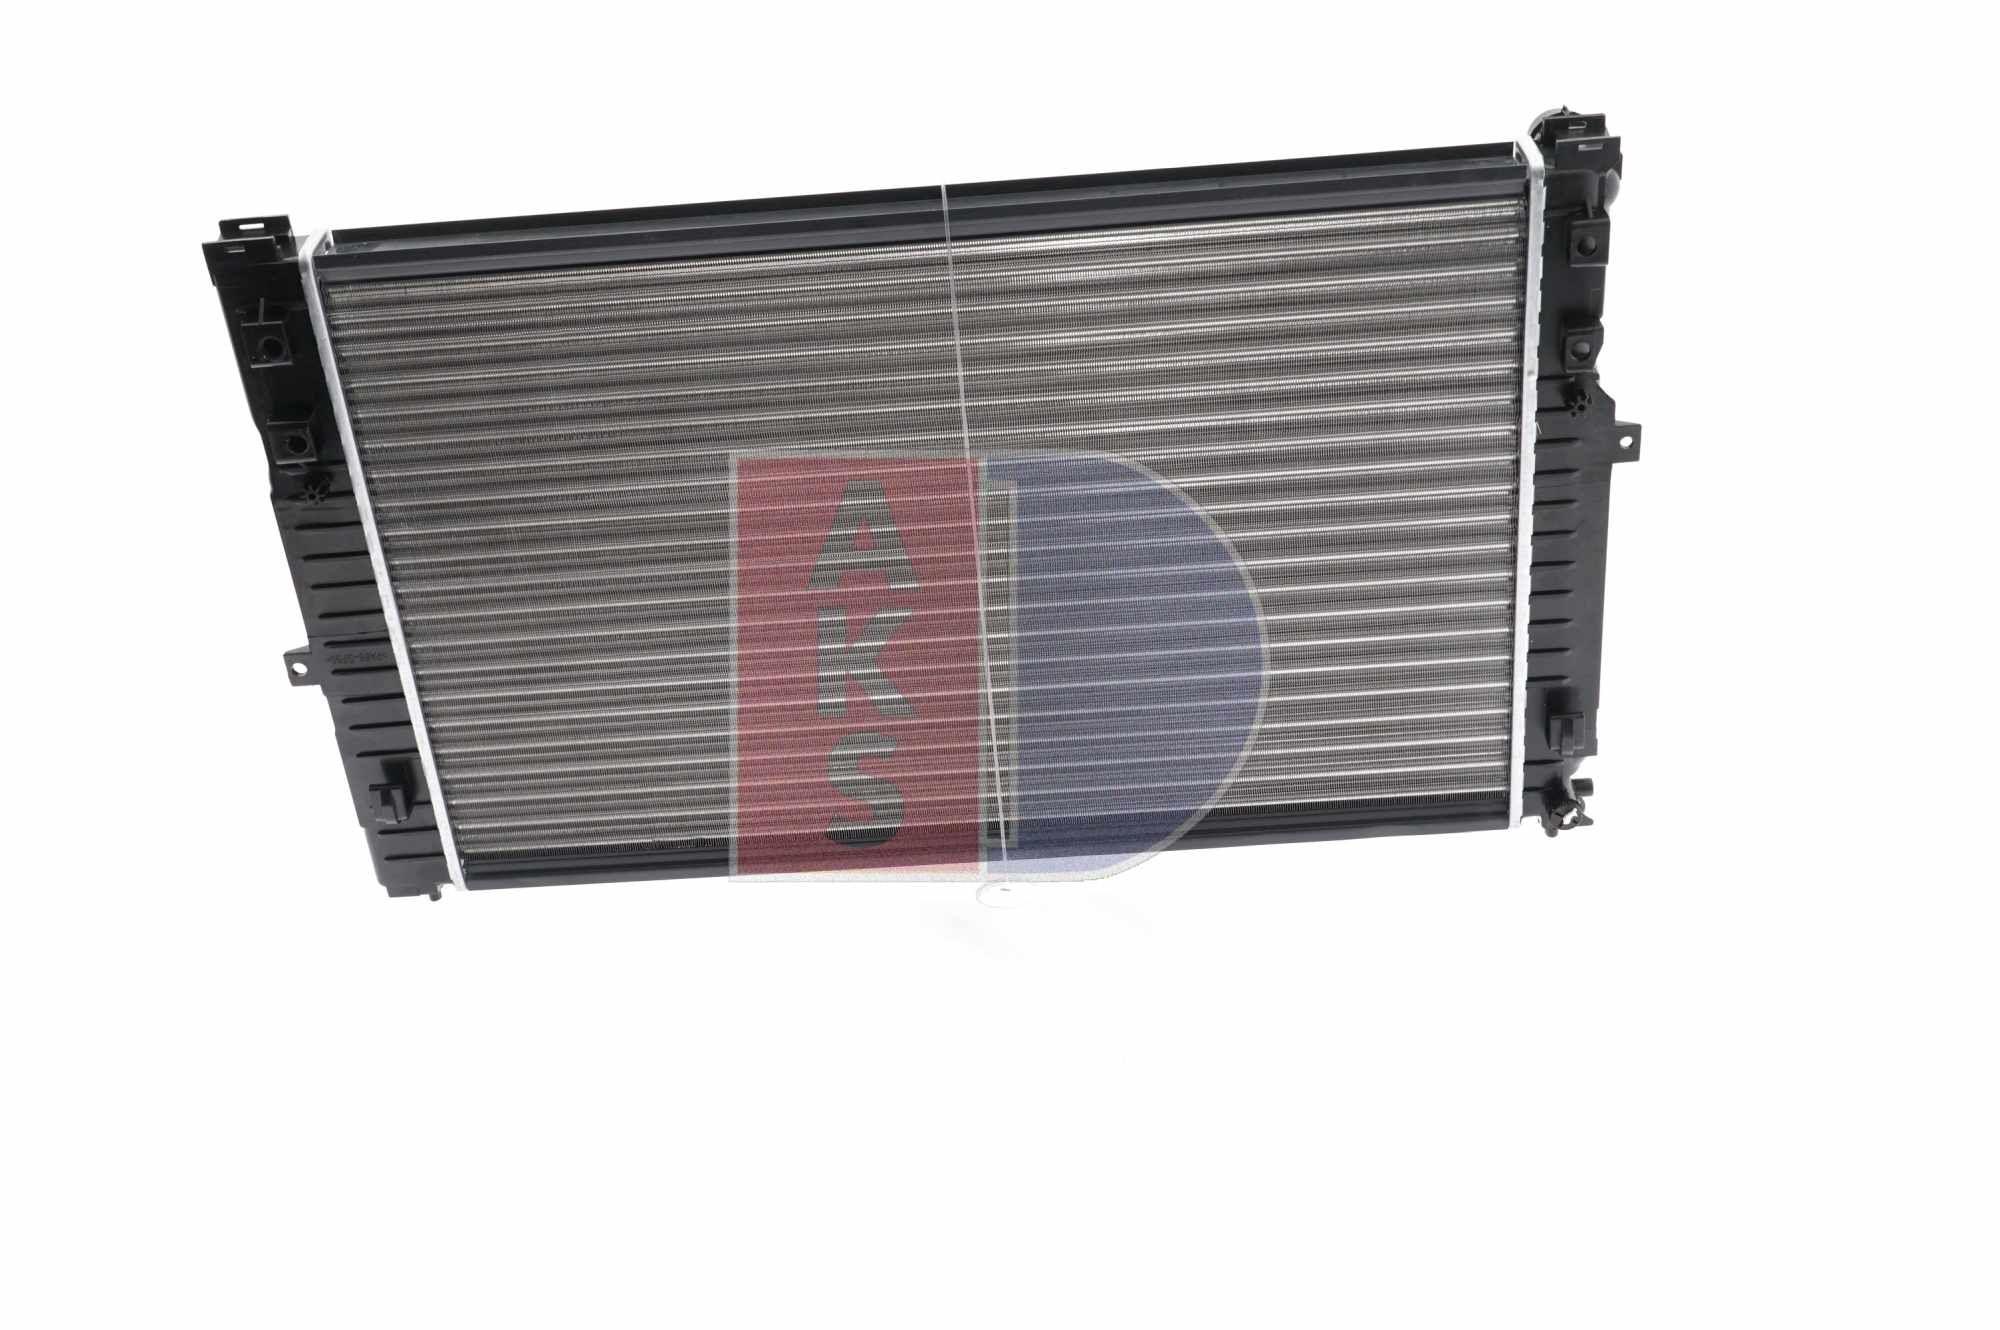 480390N Wasserkühler AKS DASIS 480390N - Große Auswahl - stark reduziert